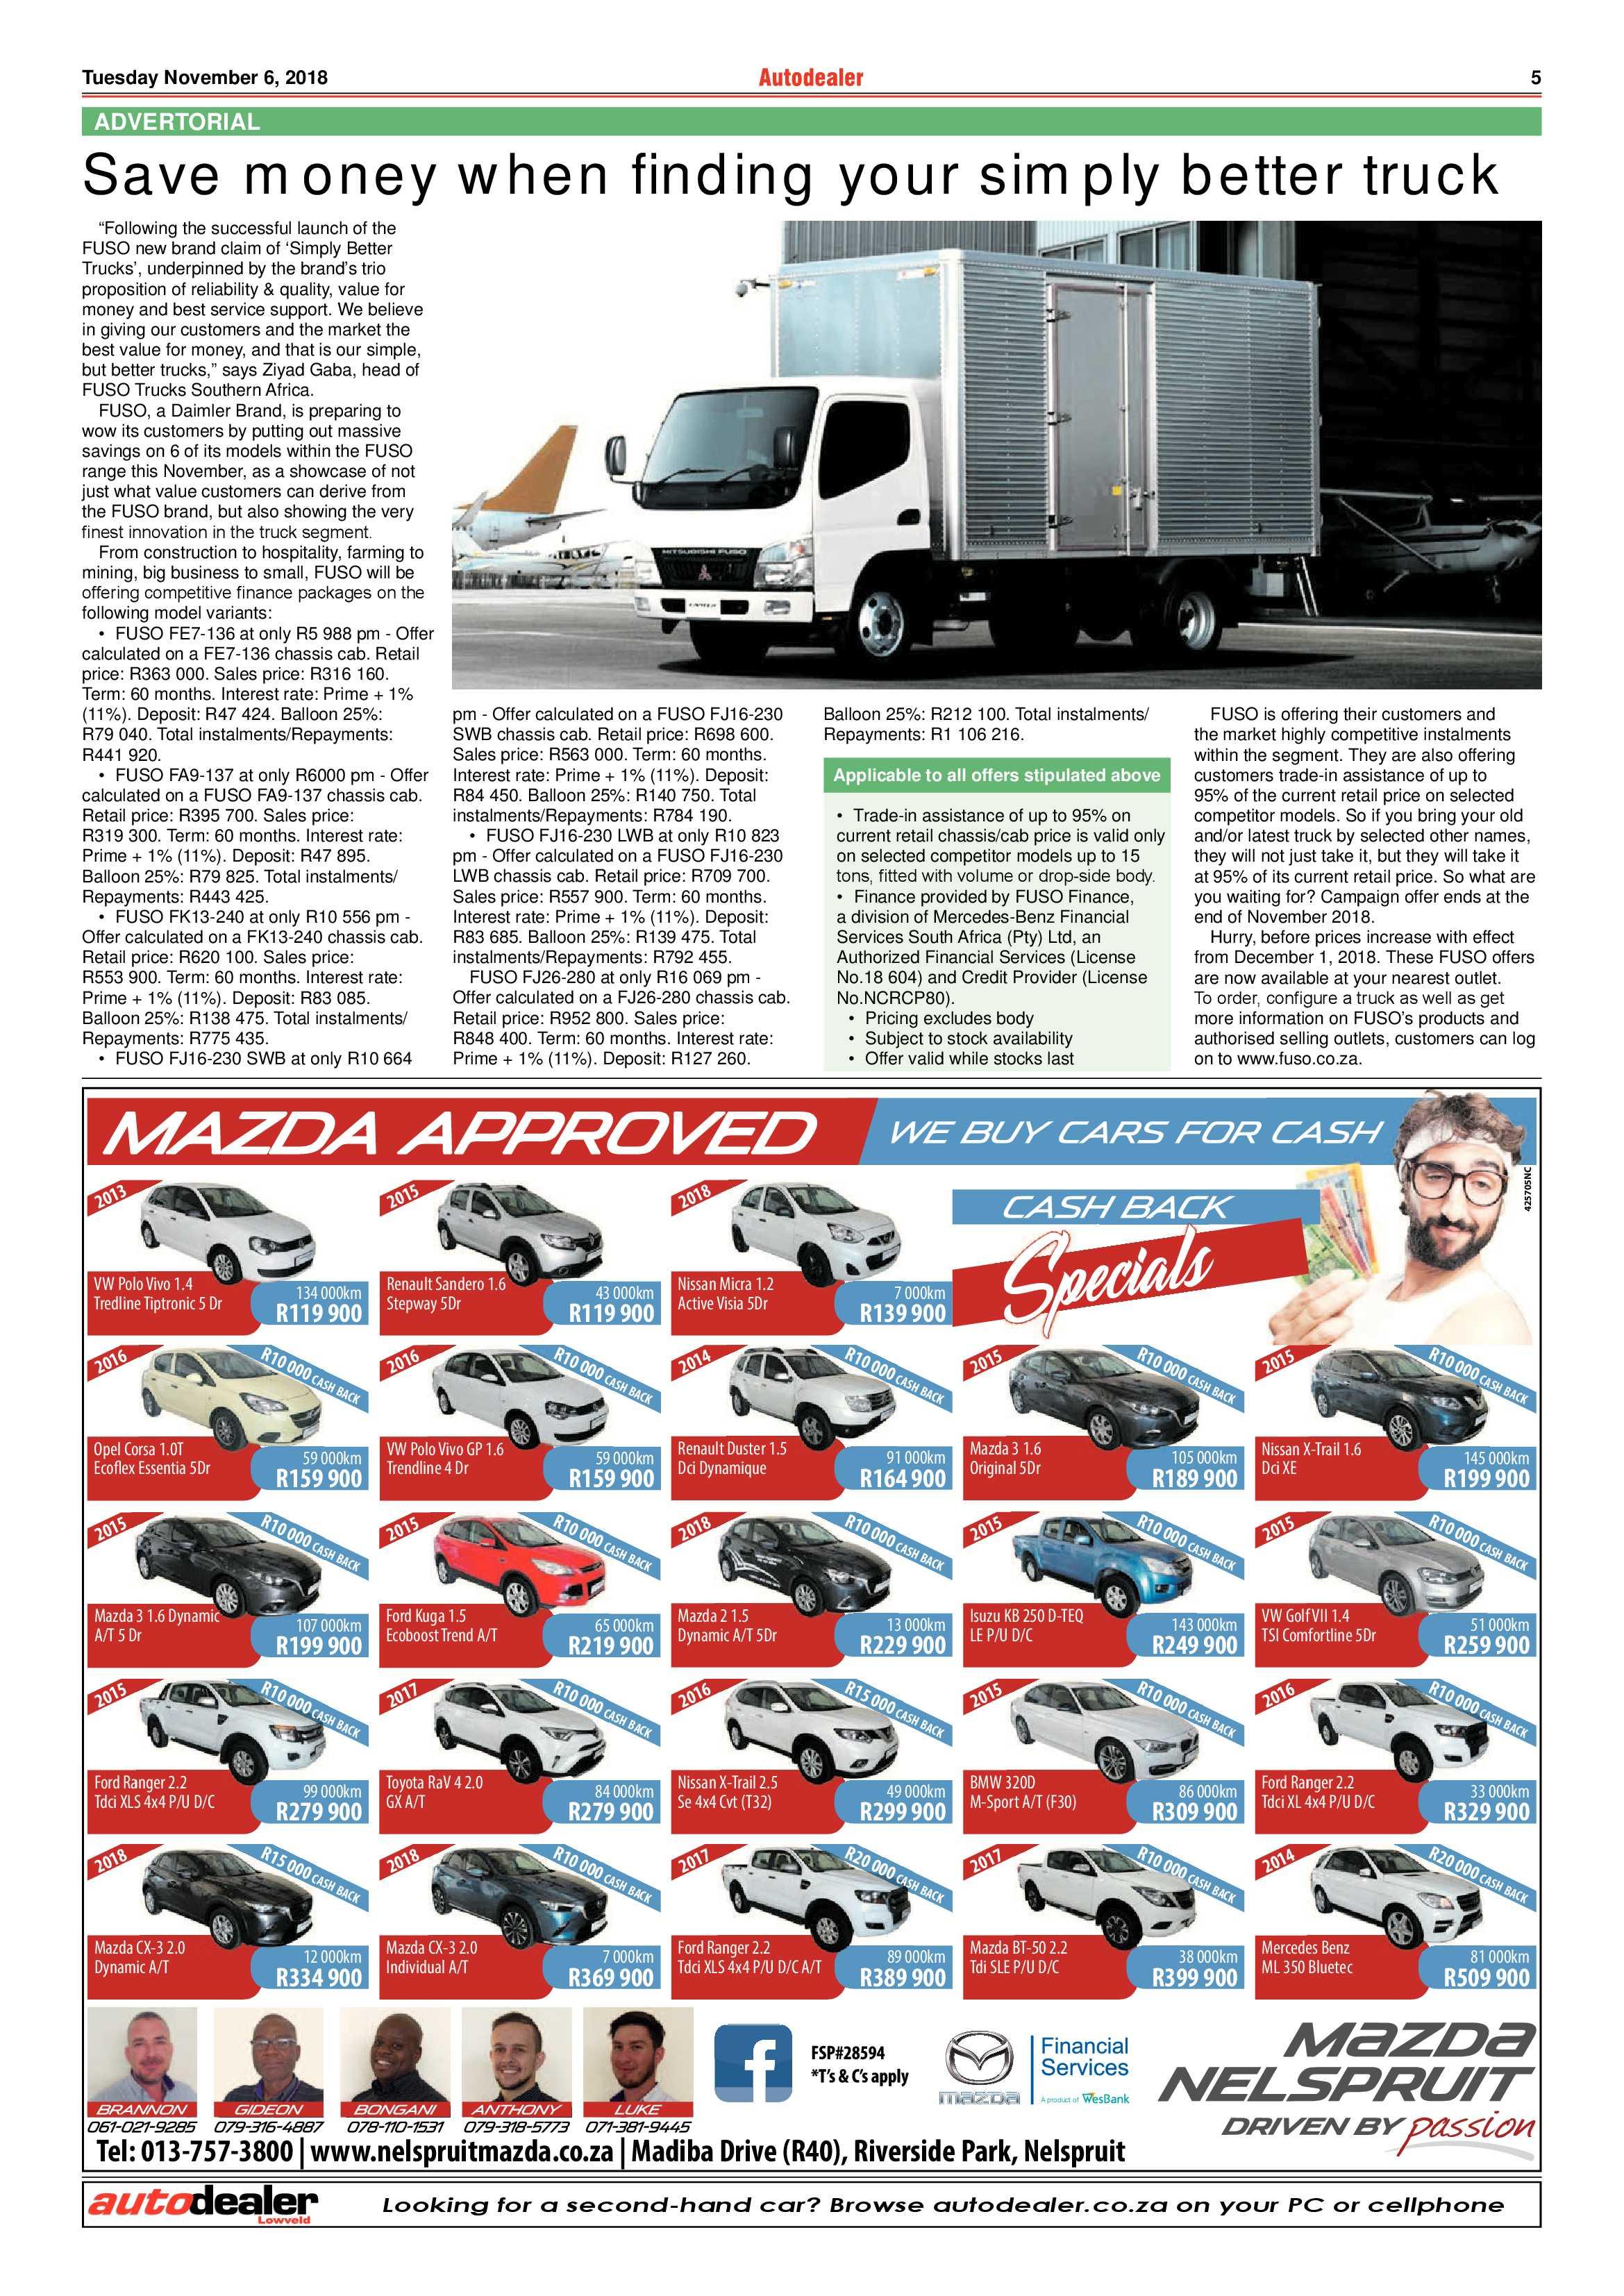 autodealer-6-november-2018-epapers-page-5